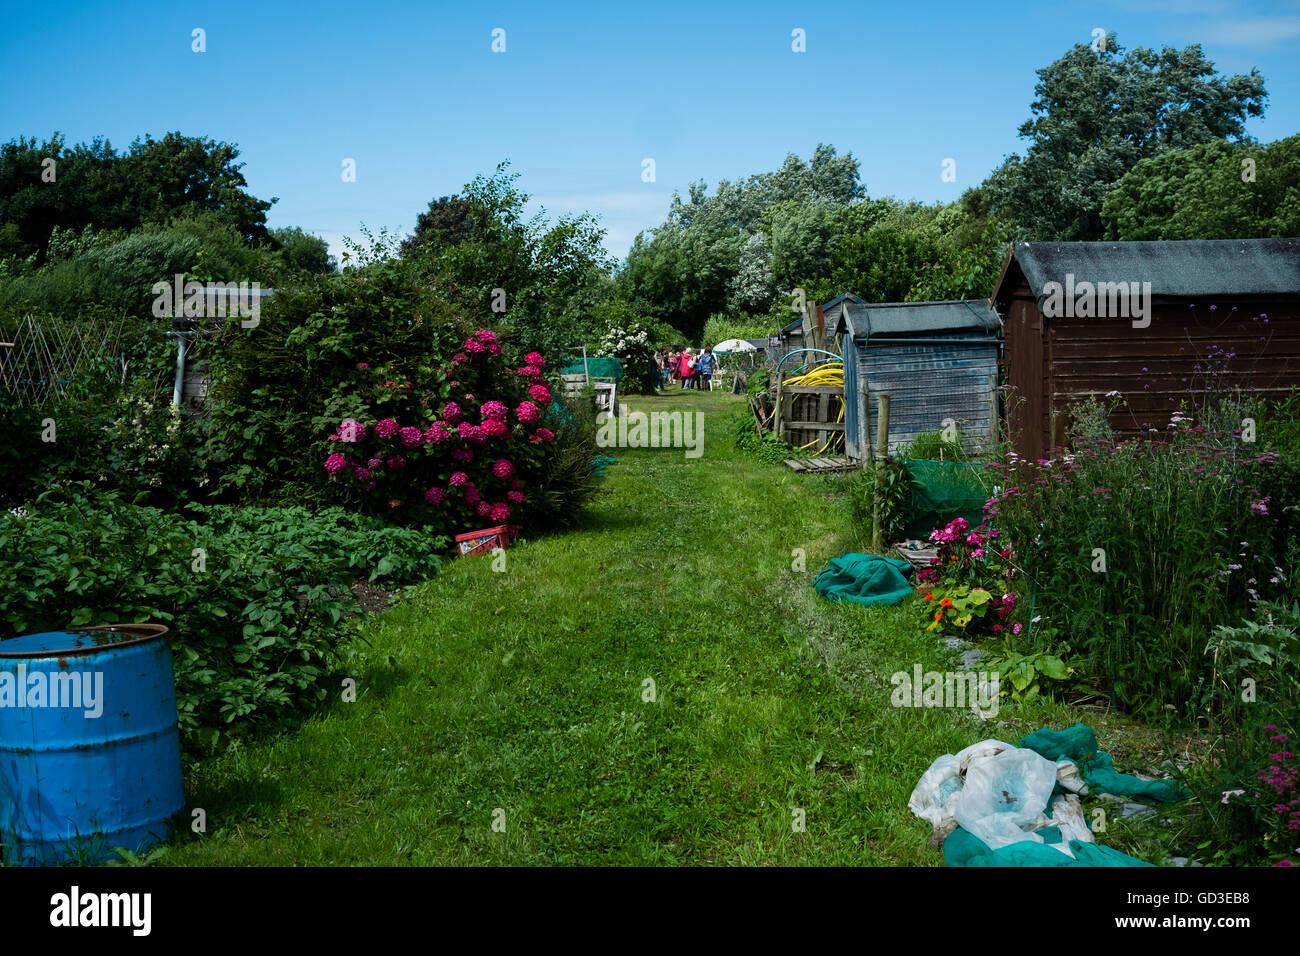 aberystwyth allotment gardens on open garden day sunday 10 july 2016